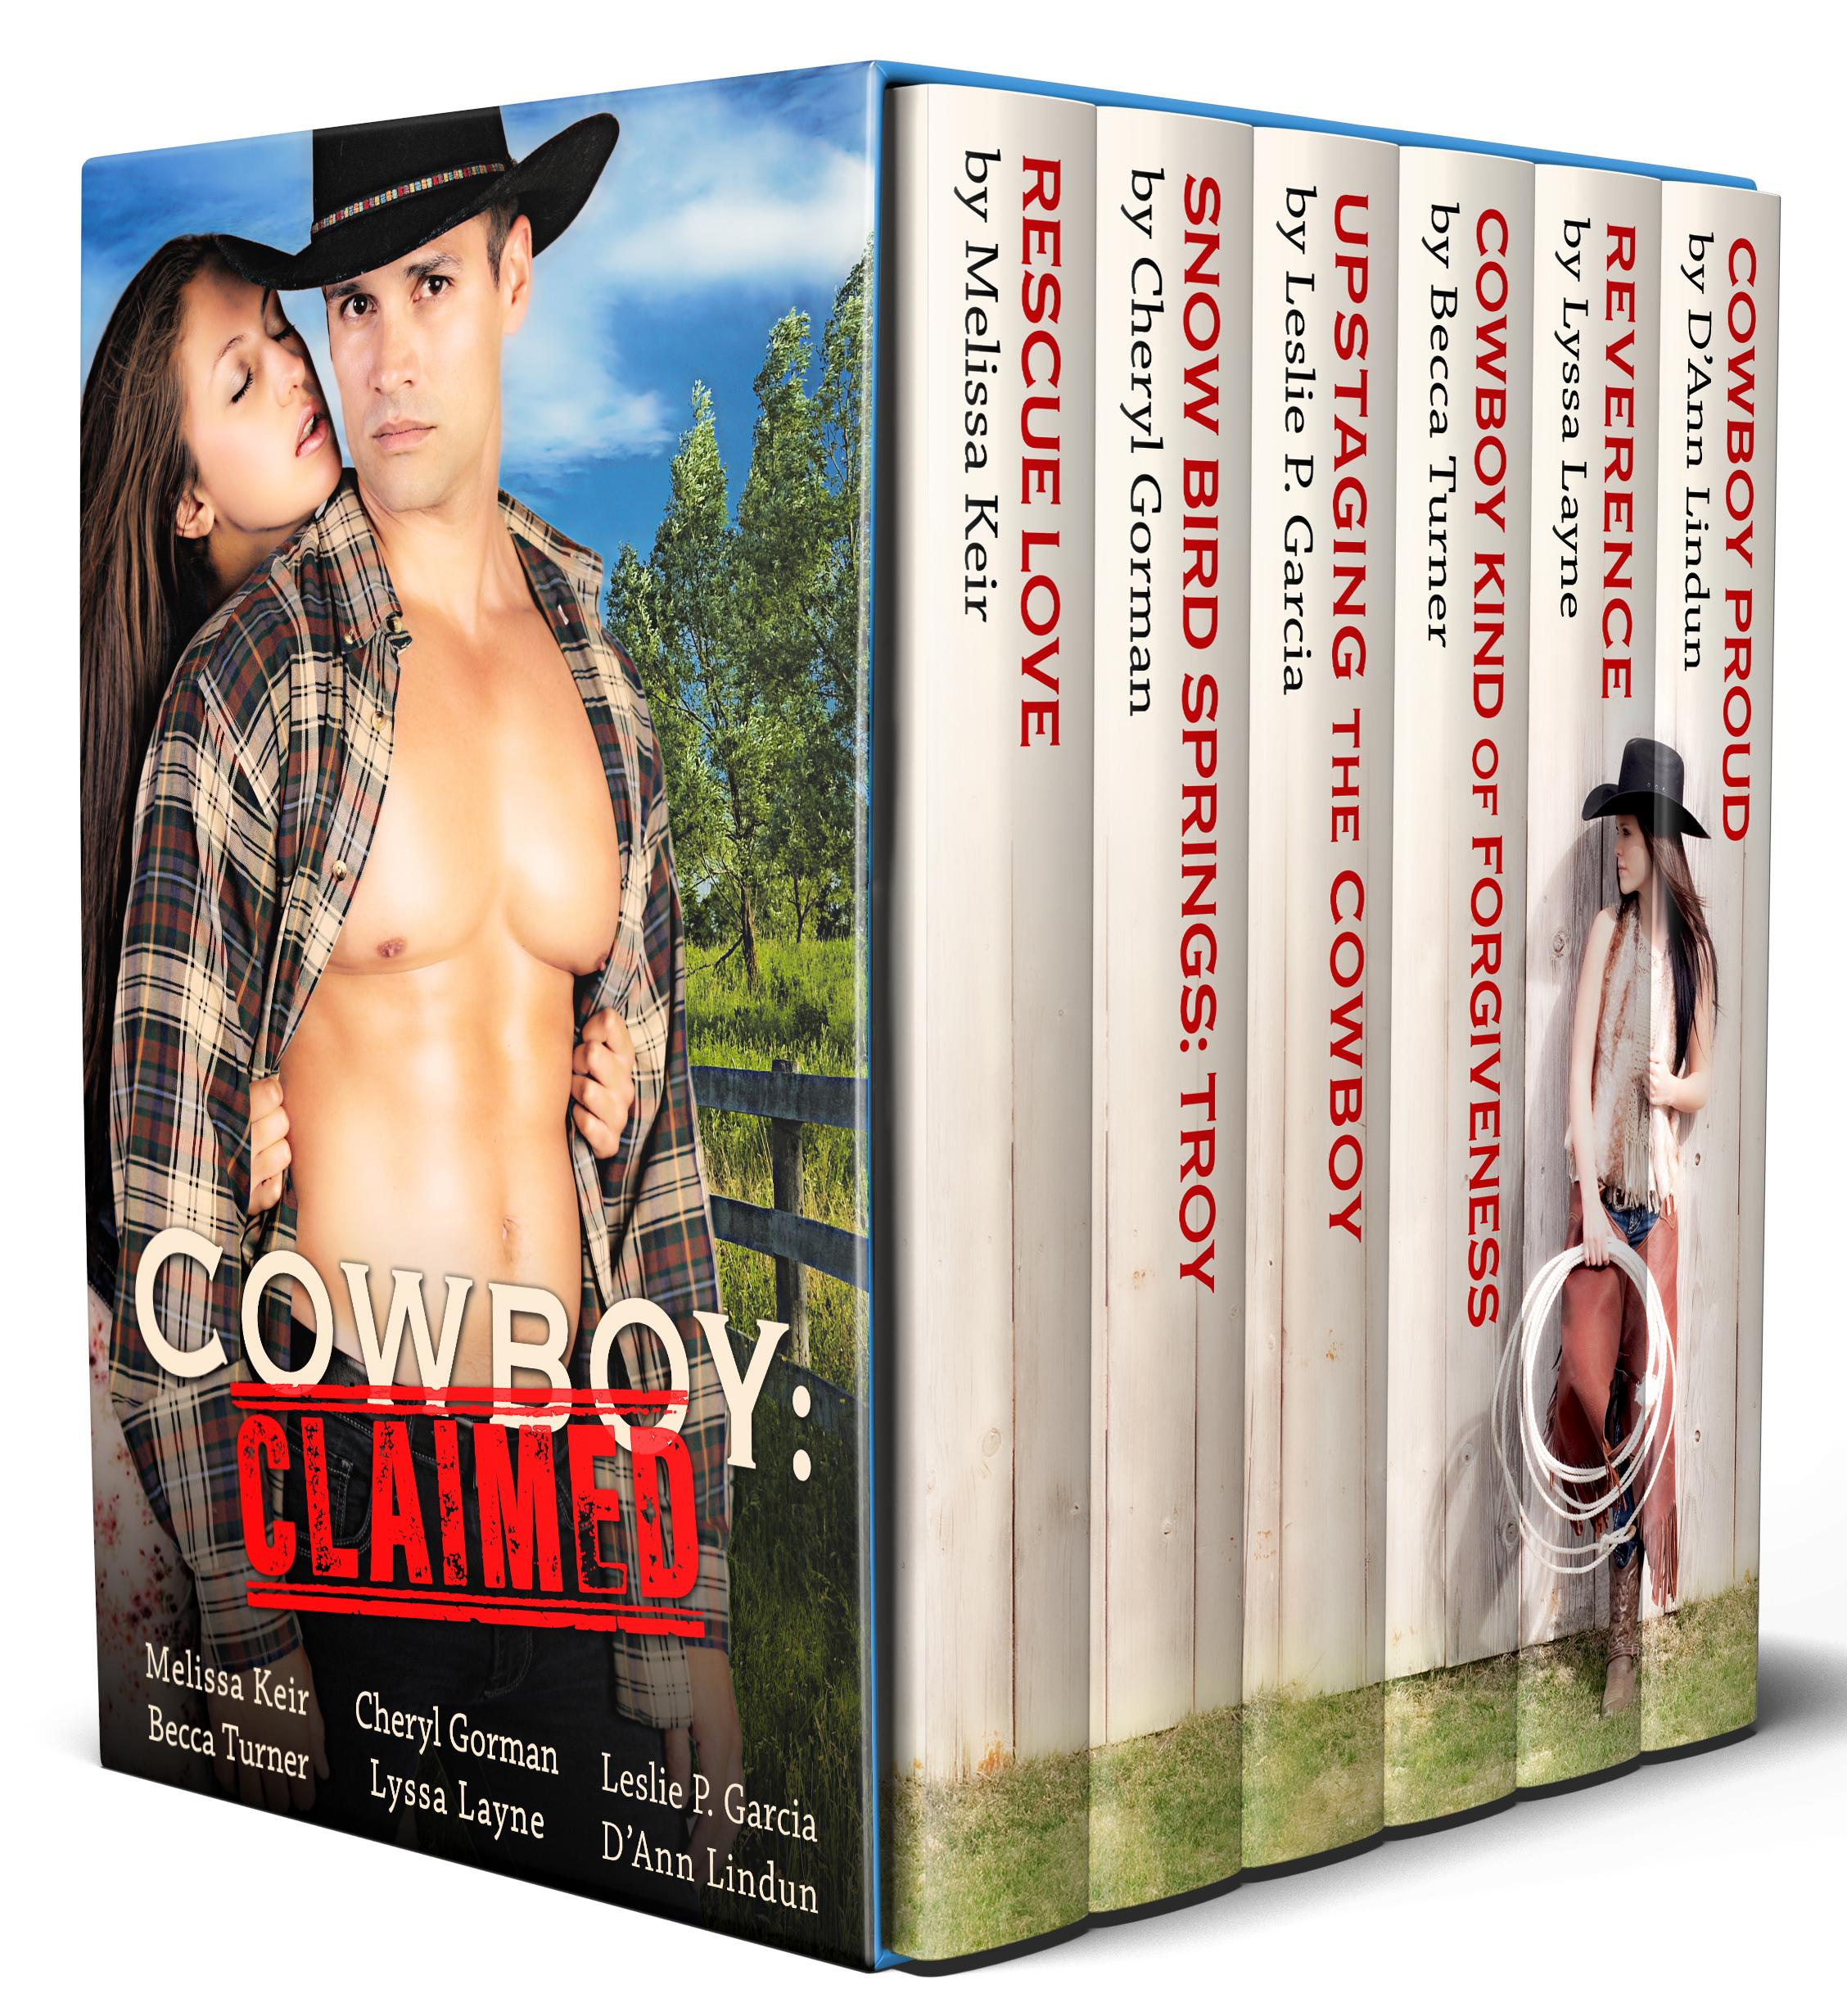 Cowboy claimes Book Cover